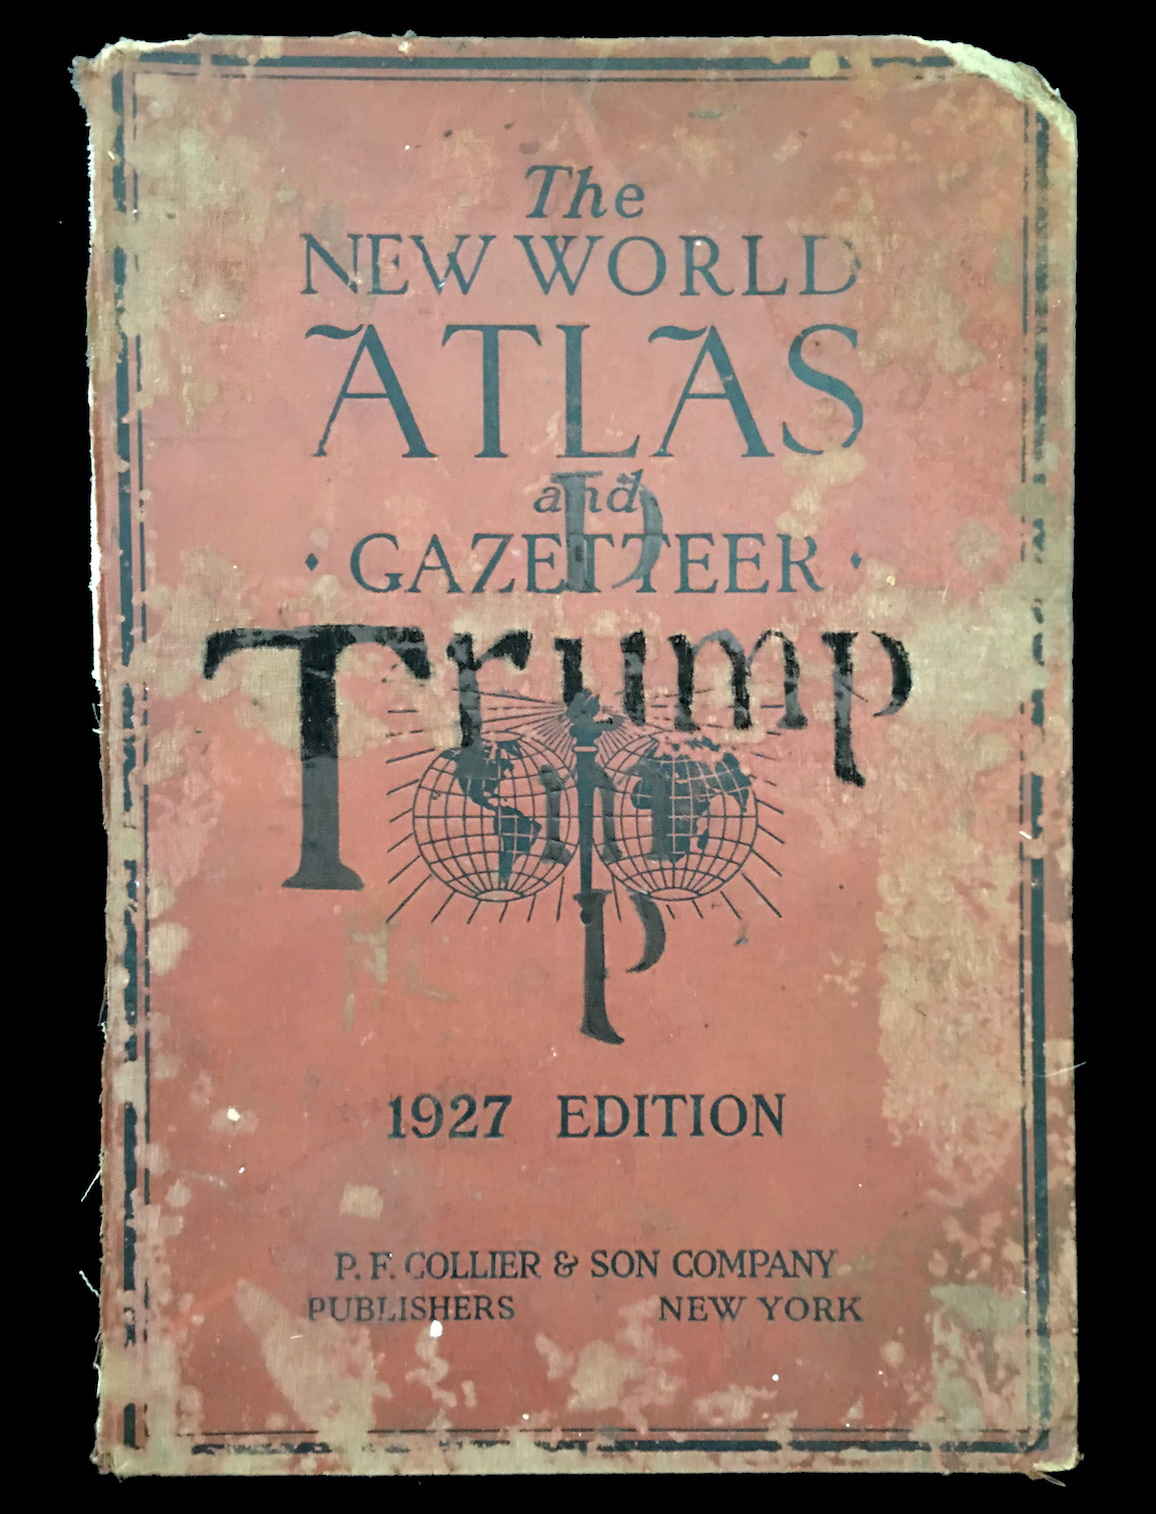 DumpTrump1927 - John Fekner